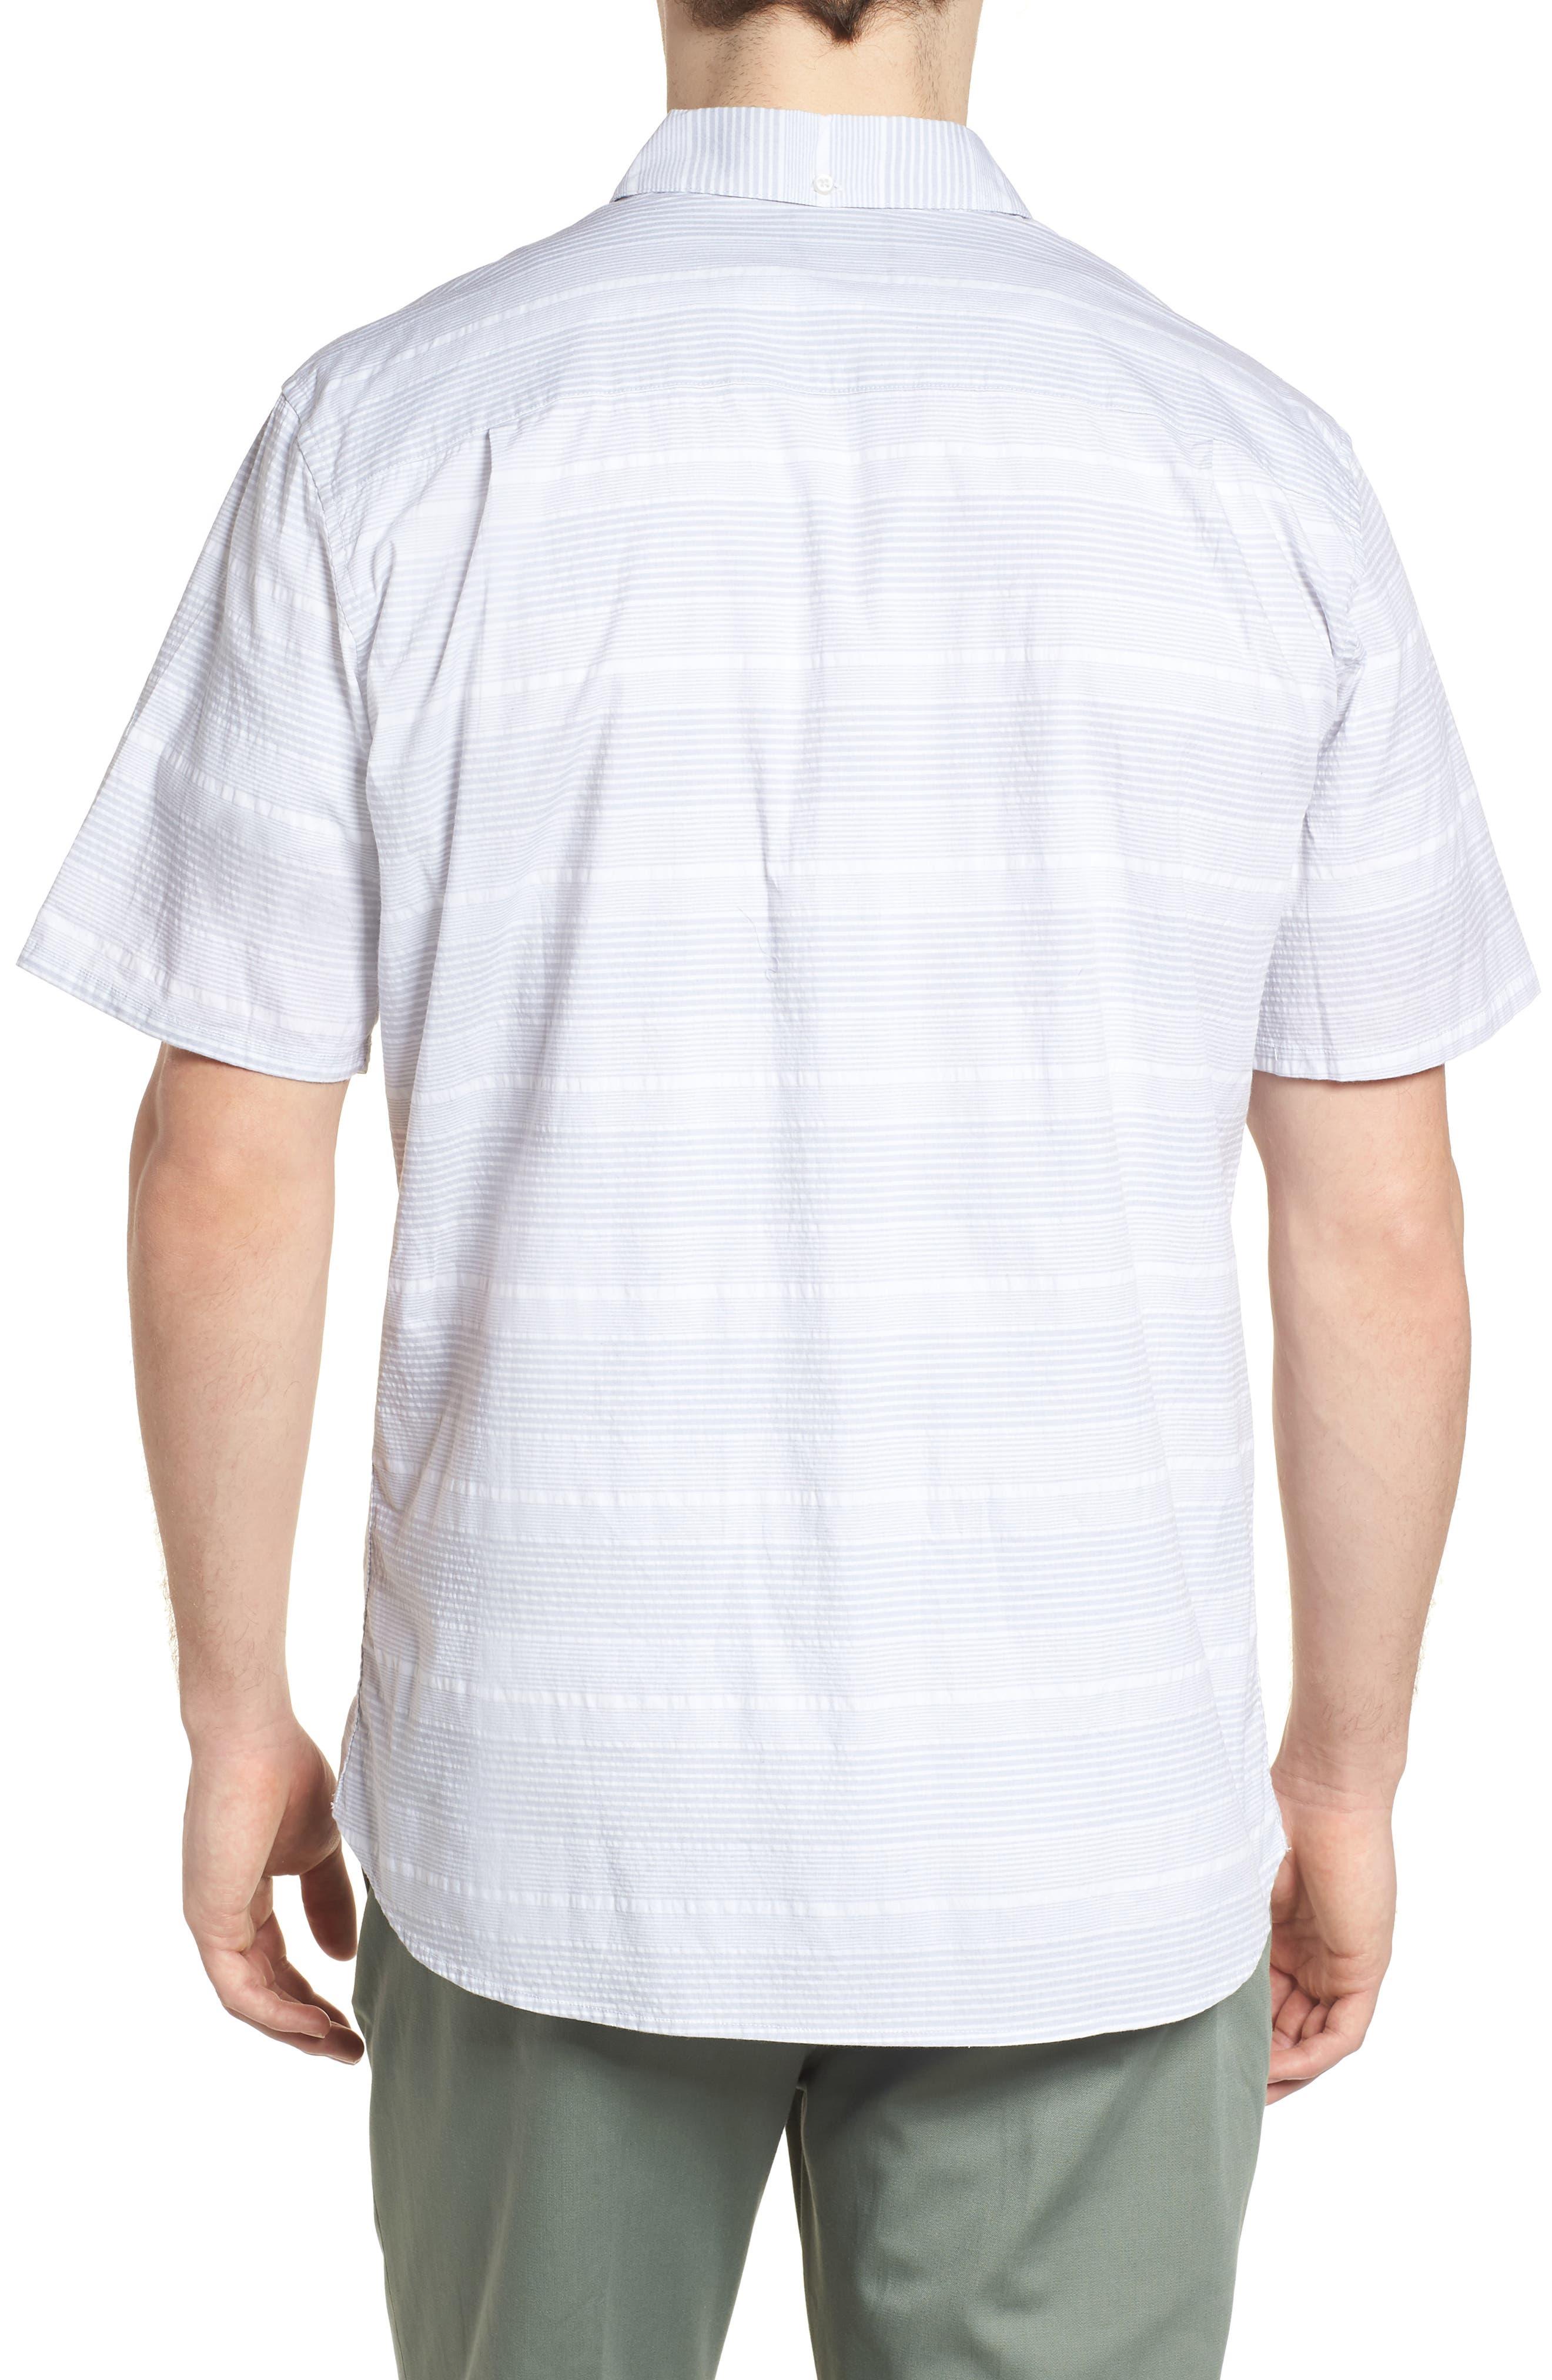 Surplus Short Sleeve Shirt,                             Alternate thumbnail 3, color,